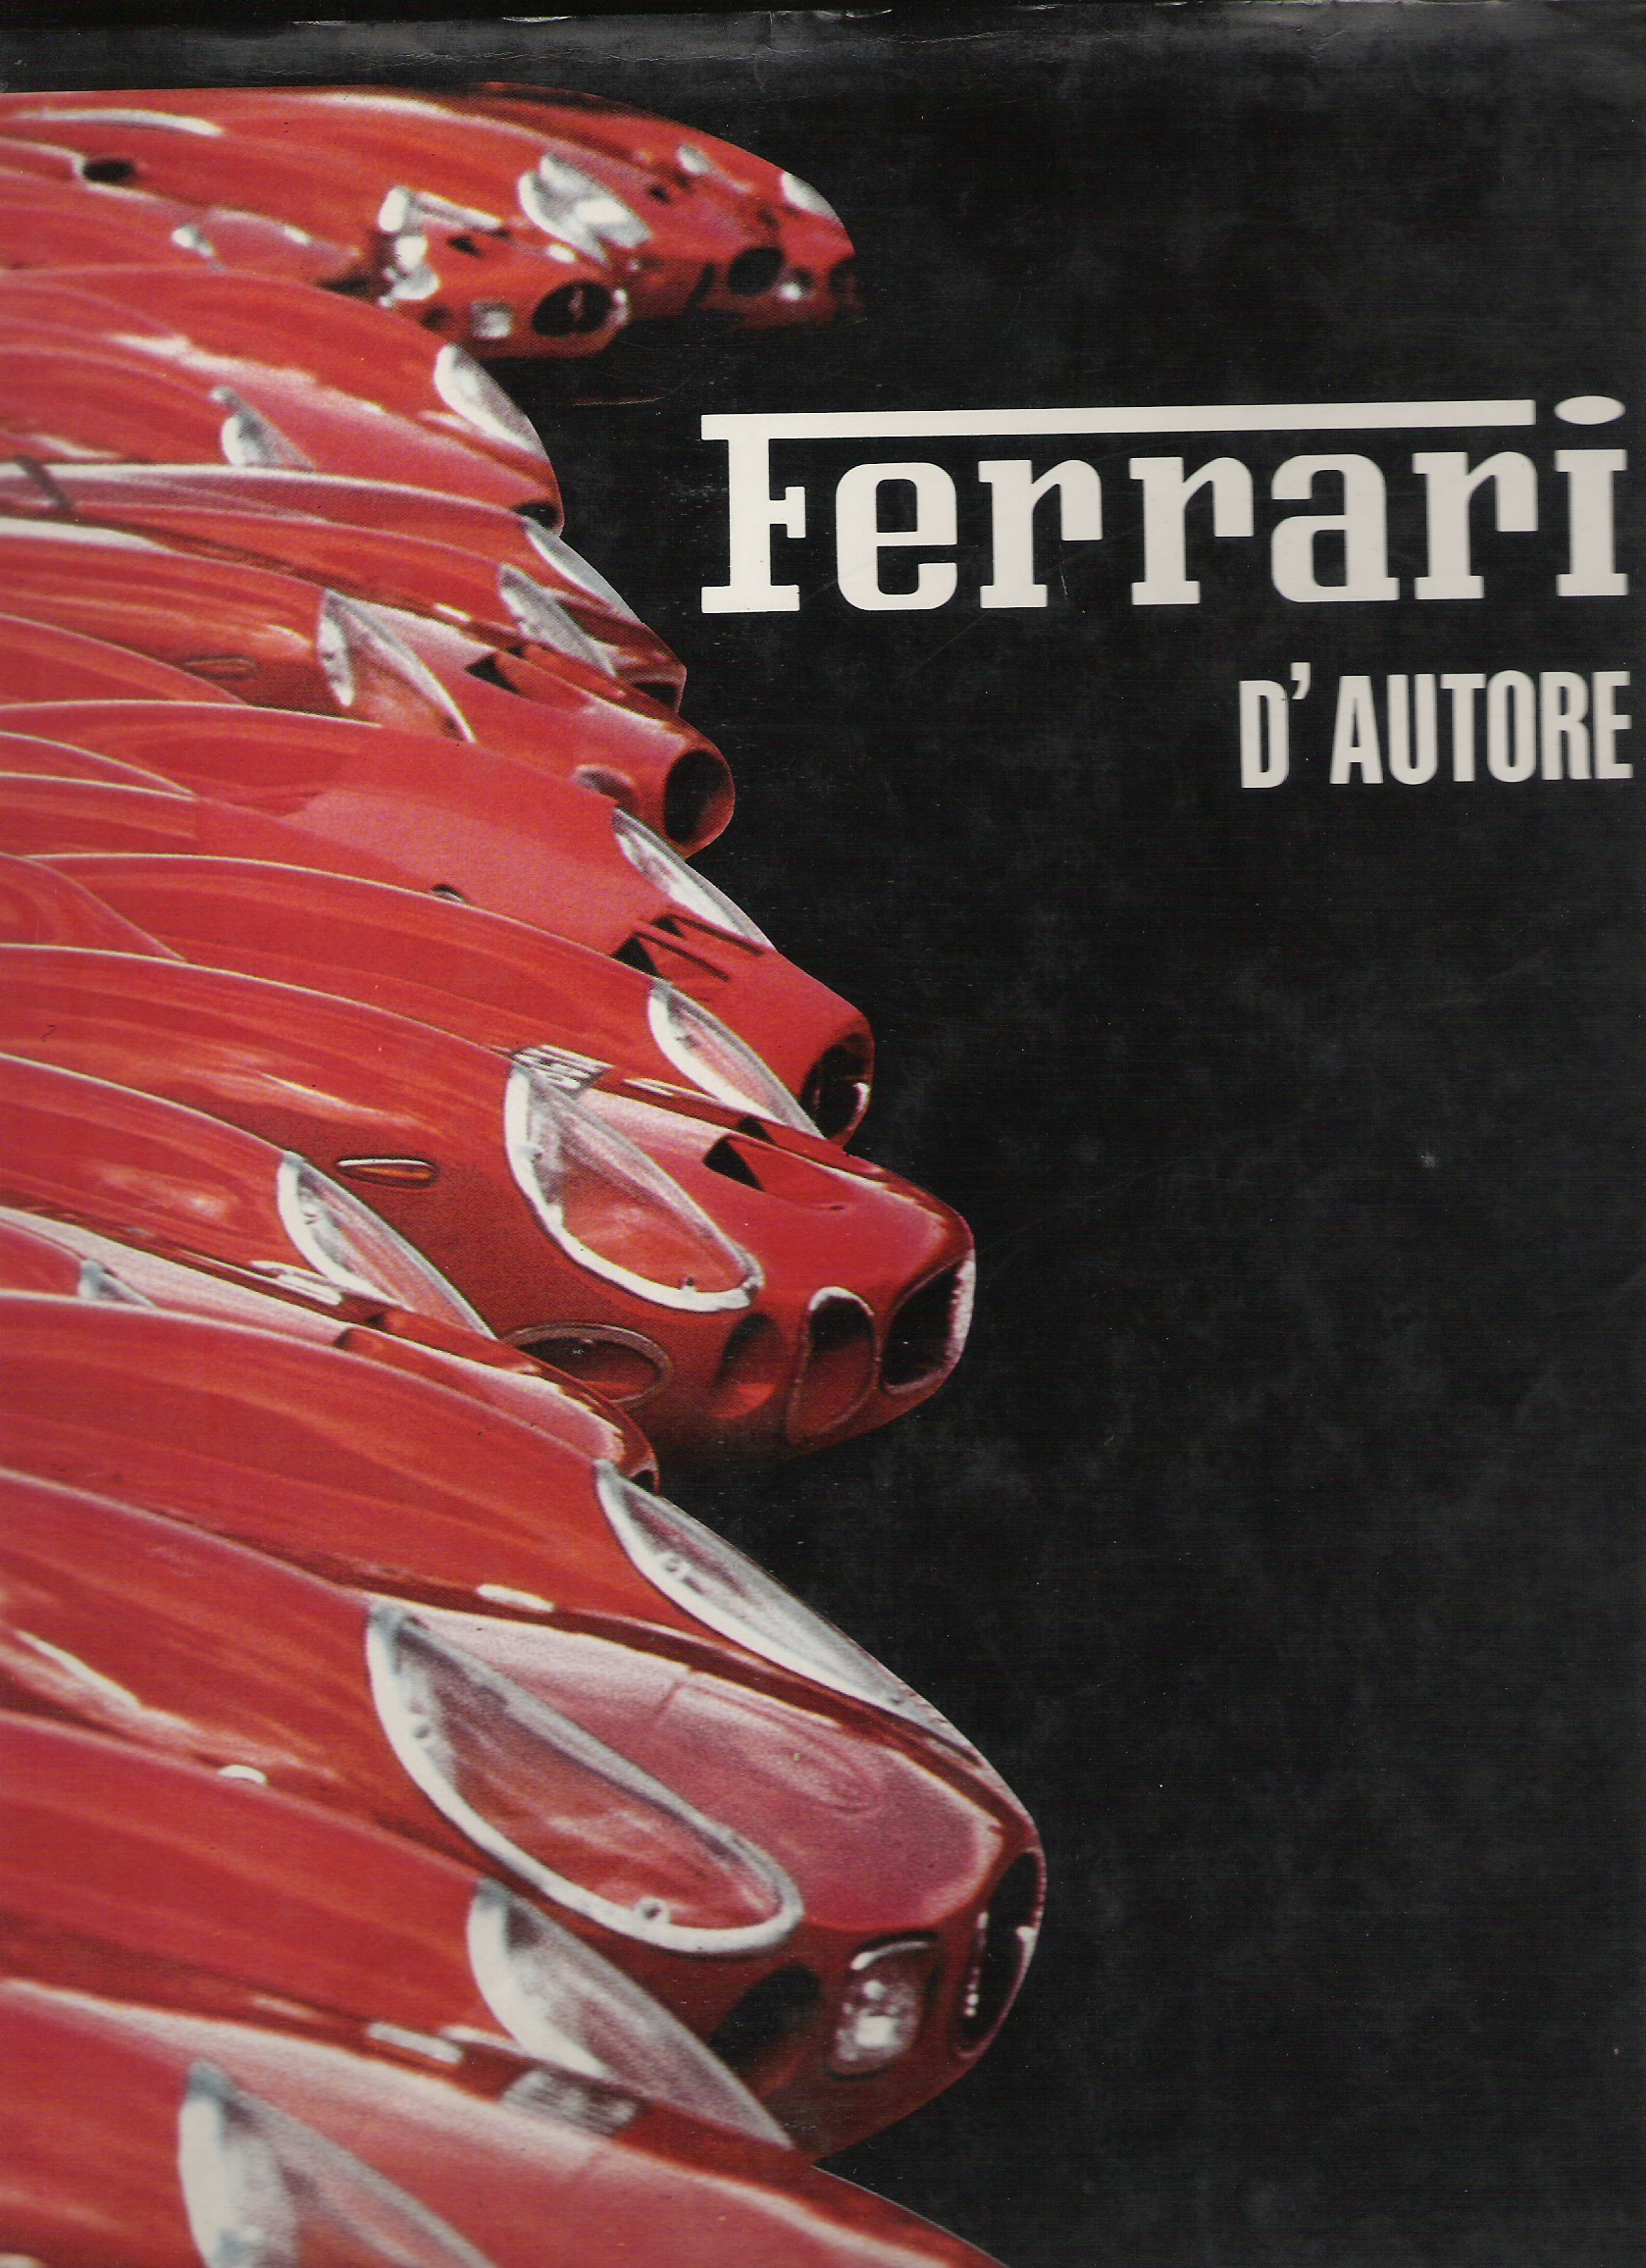 Ferrari d'autore